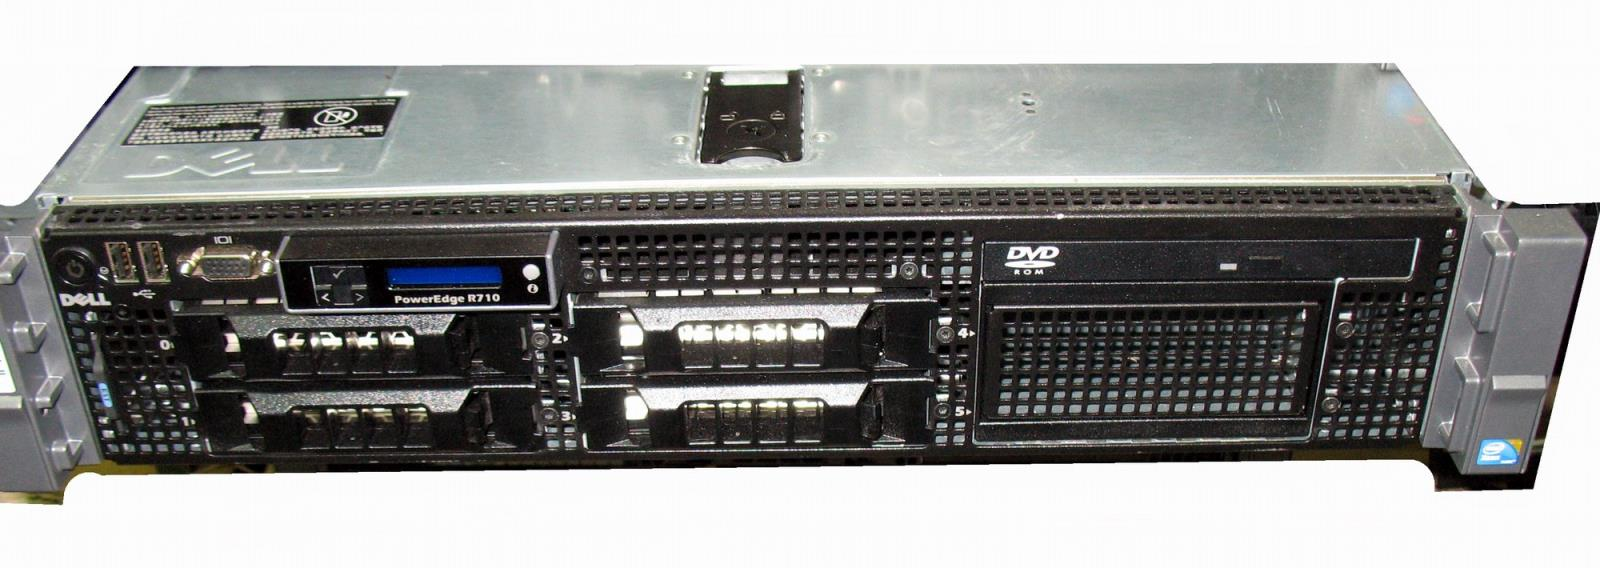 High-End Virtualization ESXi VMware Server 12-Core X5650 72GB RAM 12TB H700  Raid Dell PowerEdge R710